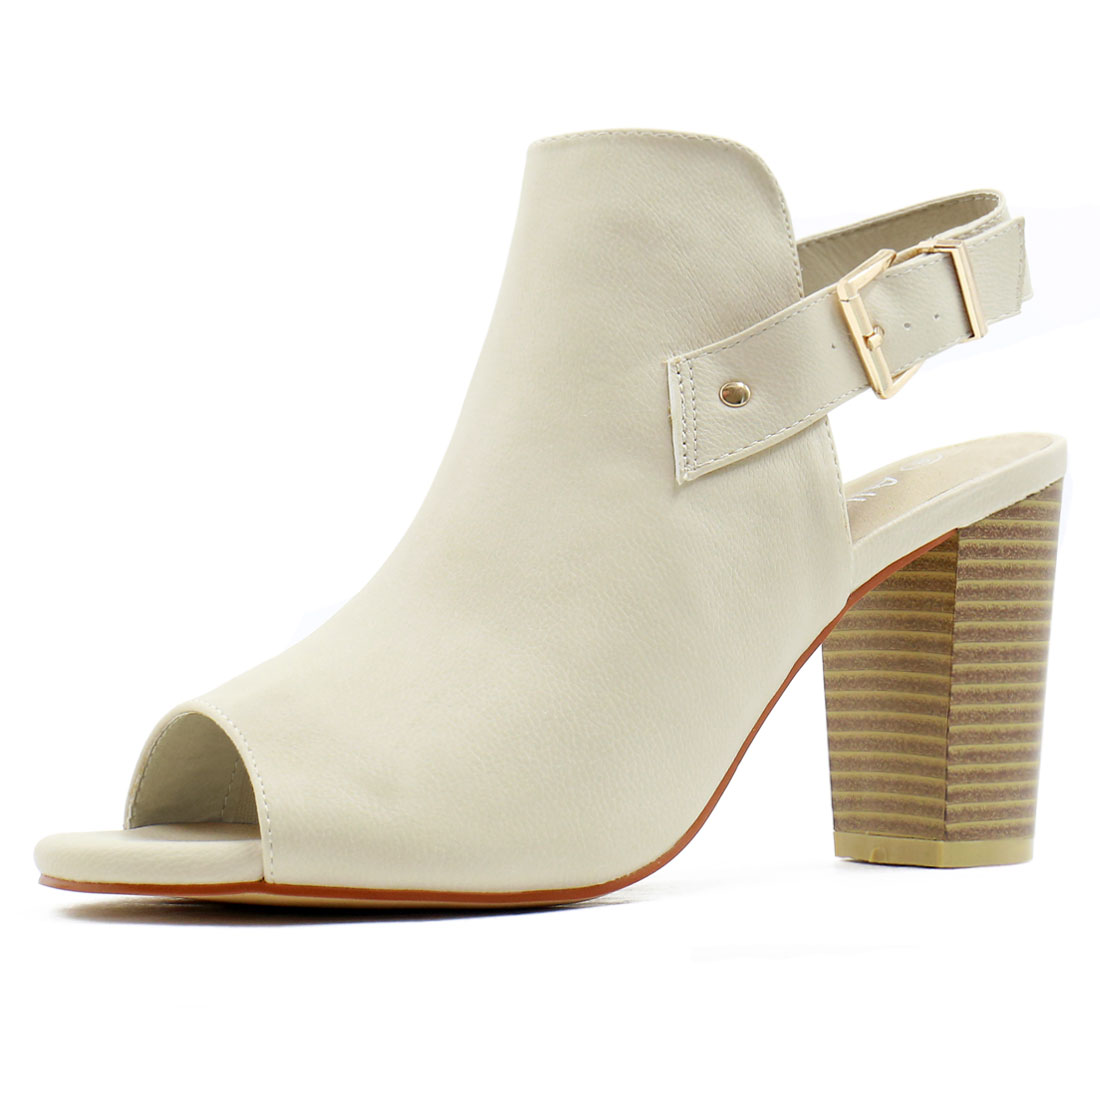 Women Peep Toe Slip On Stacked Heel Slingback Sandals Ivory US 5.5